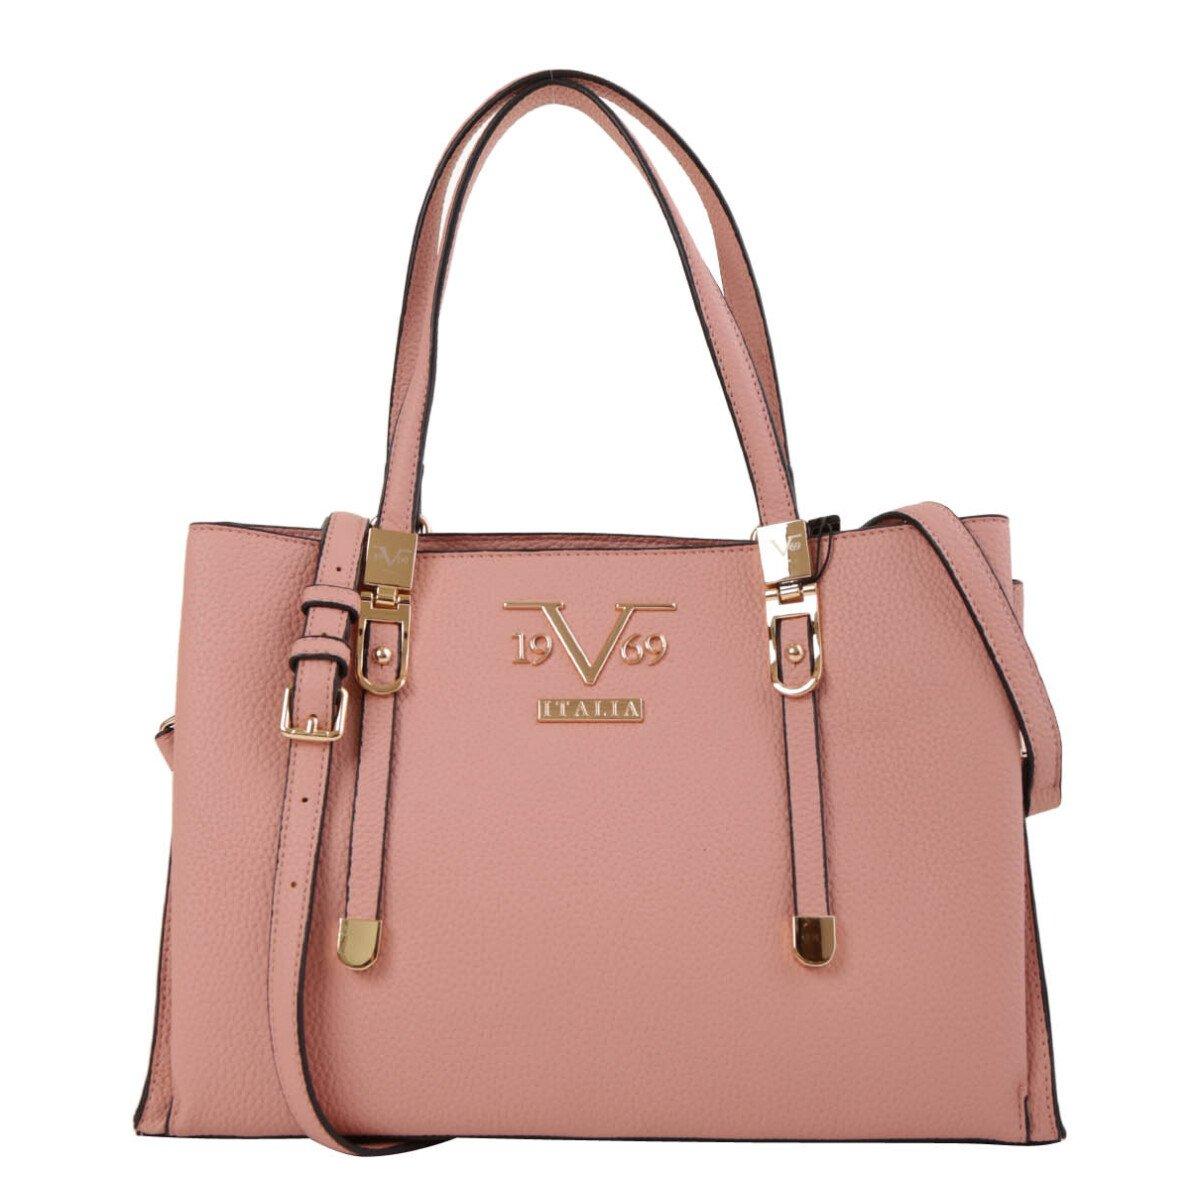 19v69 Italia Women's Handbag Various Colours 318969 - pink UNICA